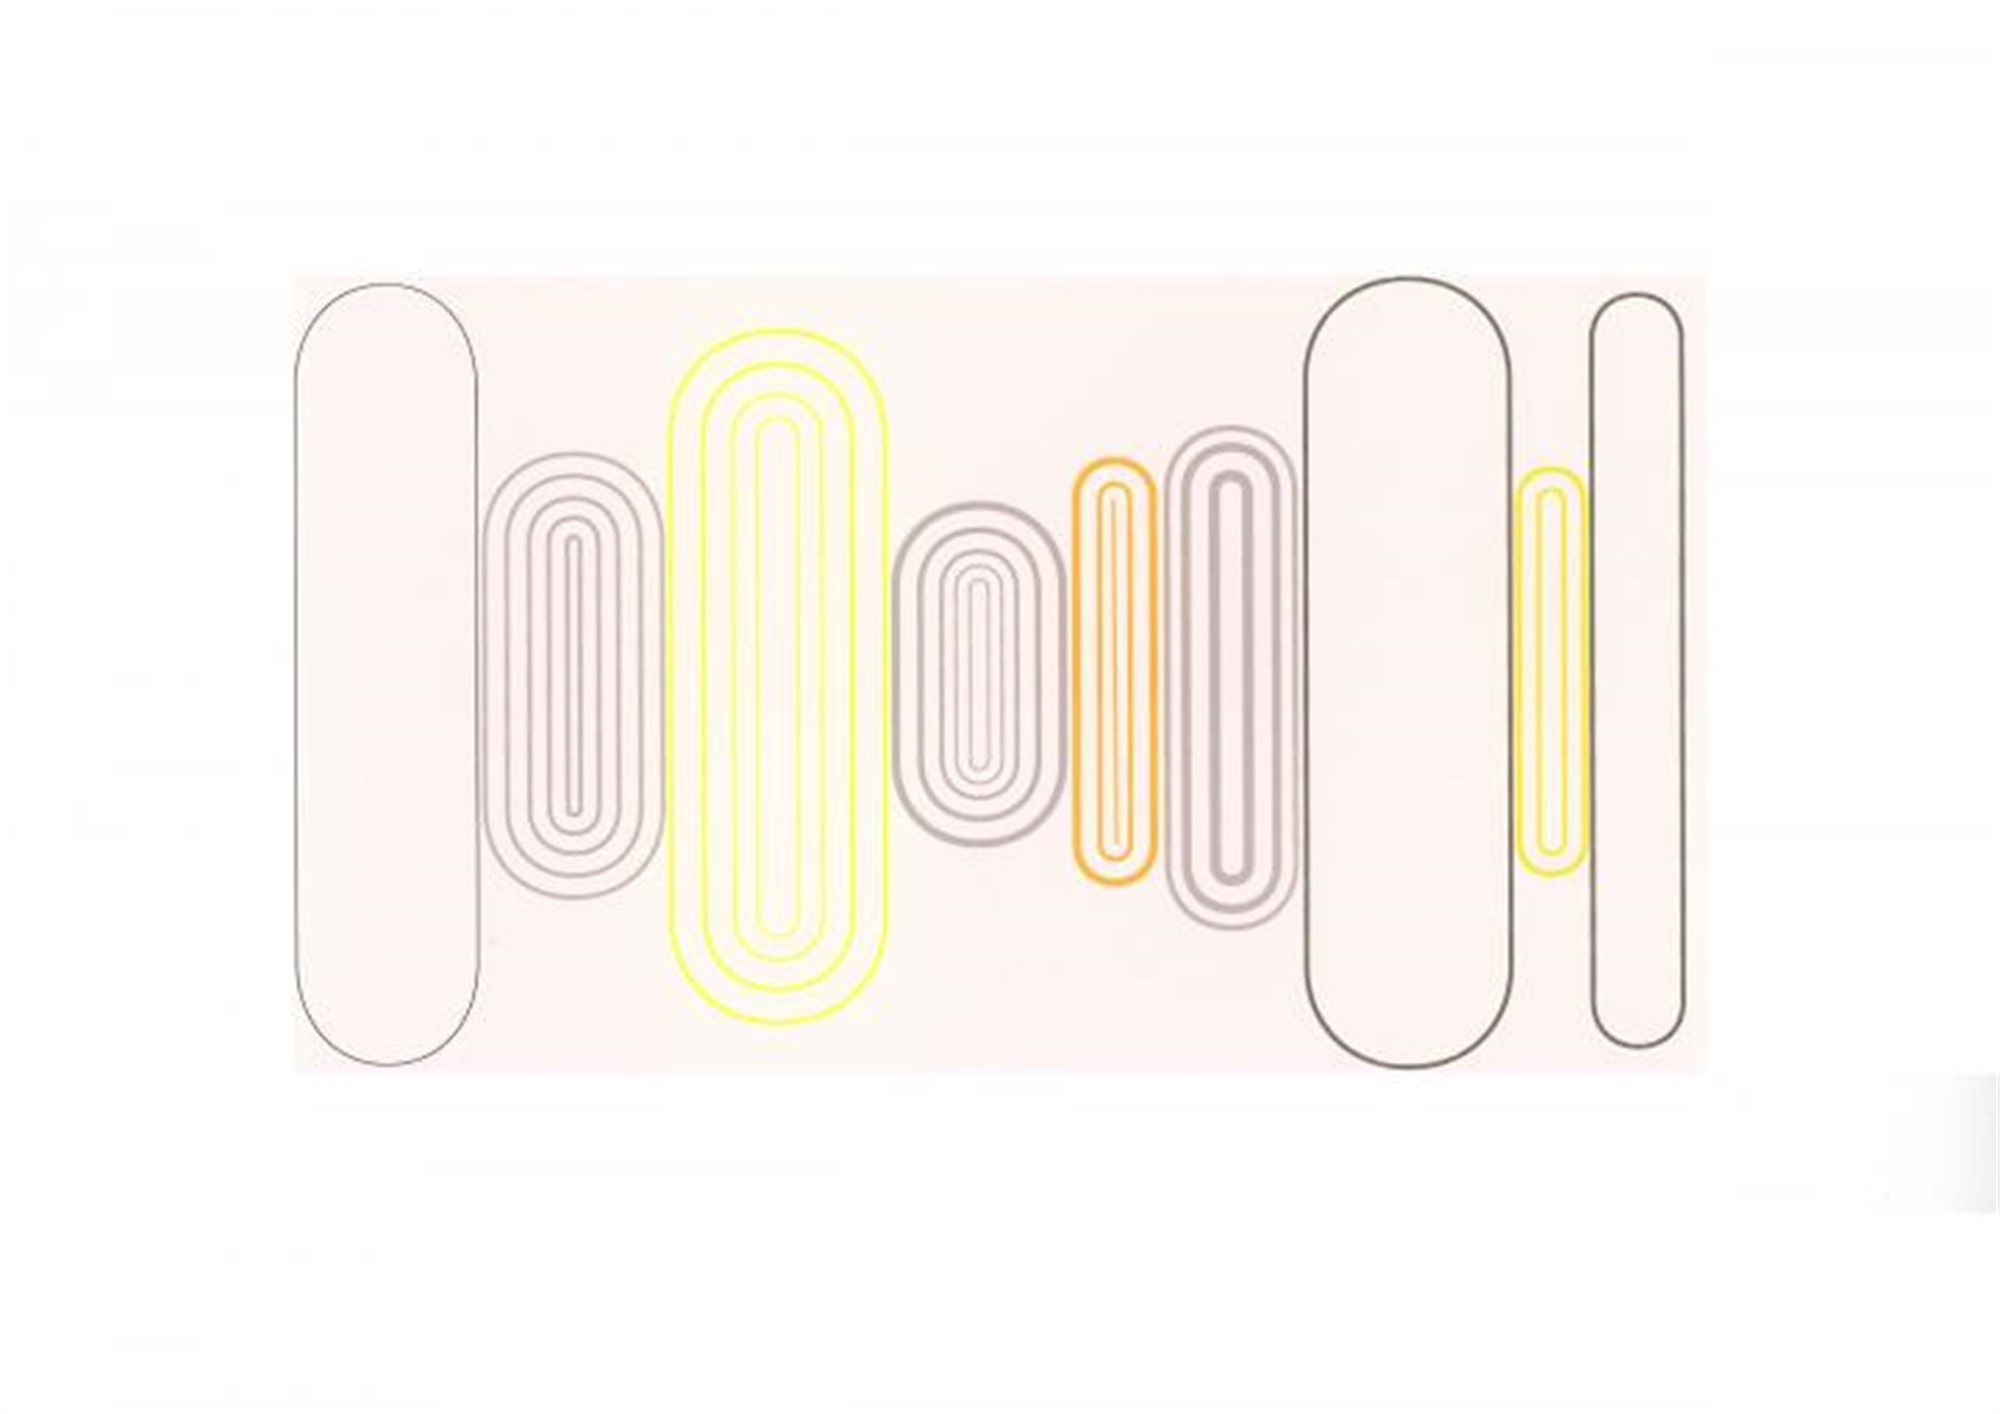 Bright Surroundings by John Tremblay